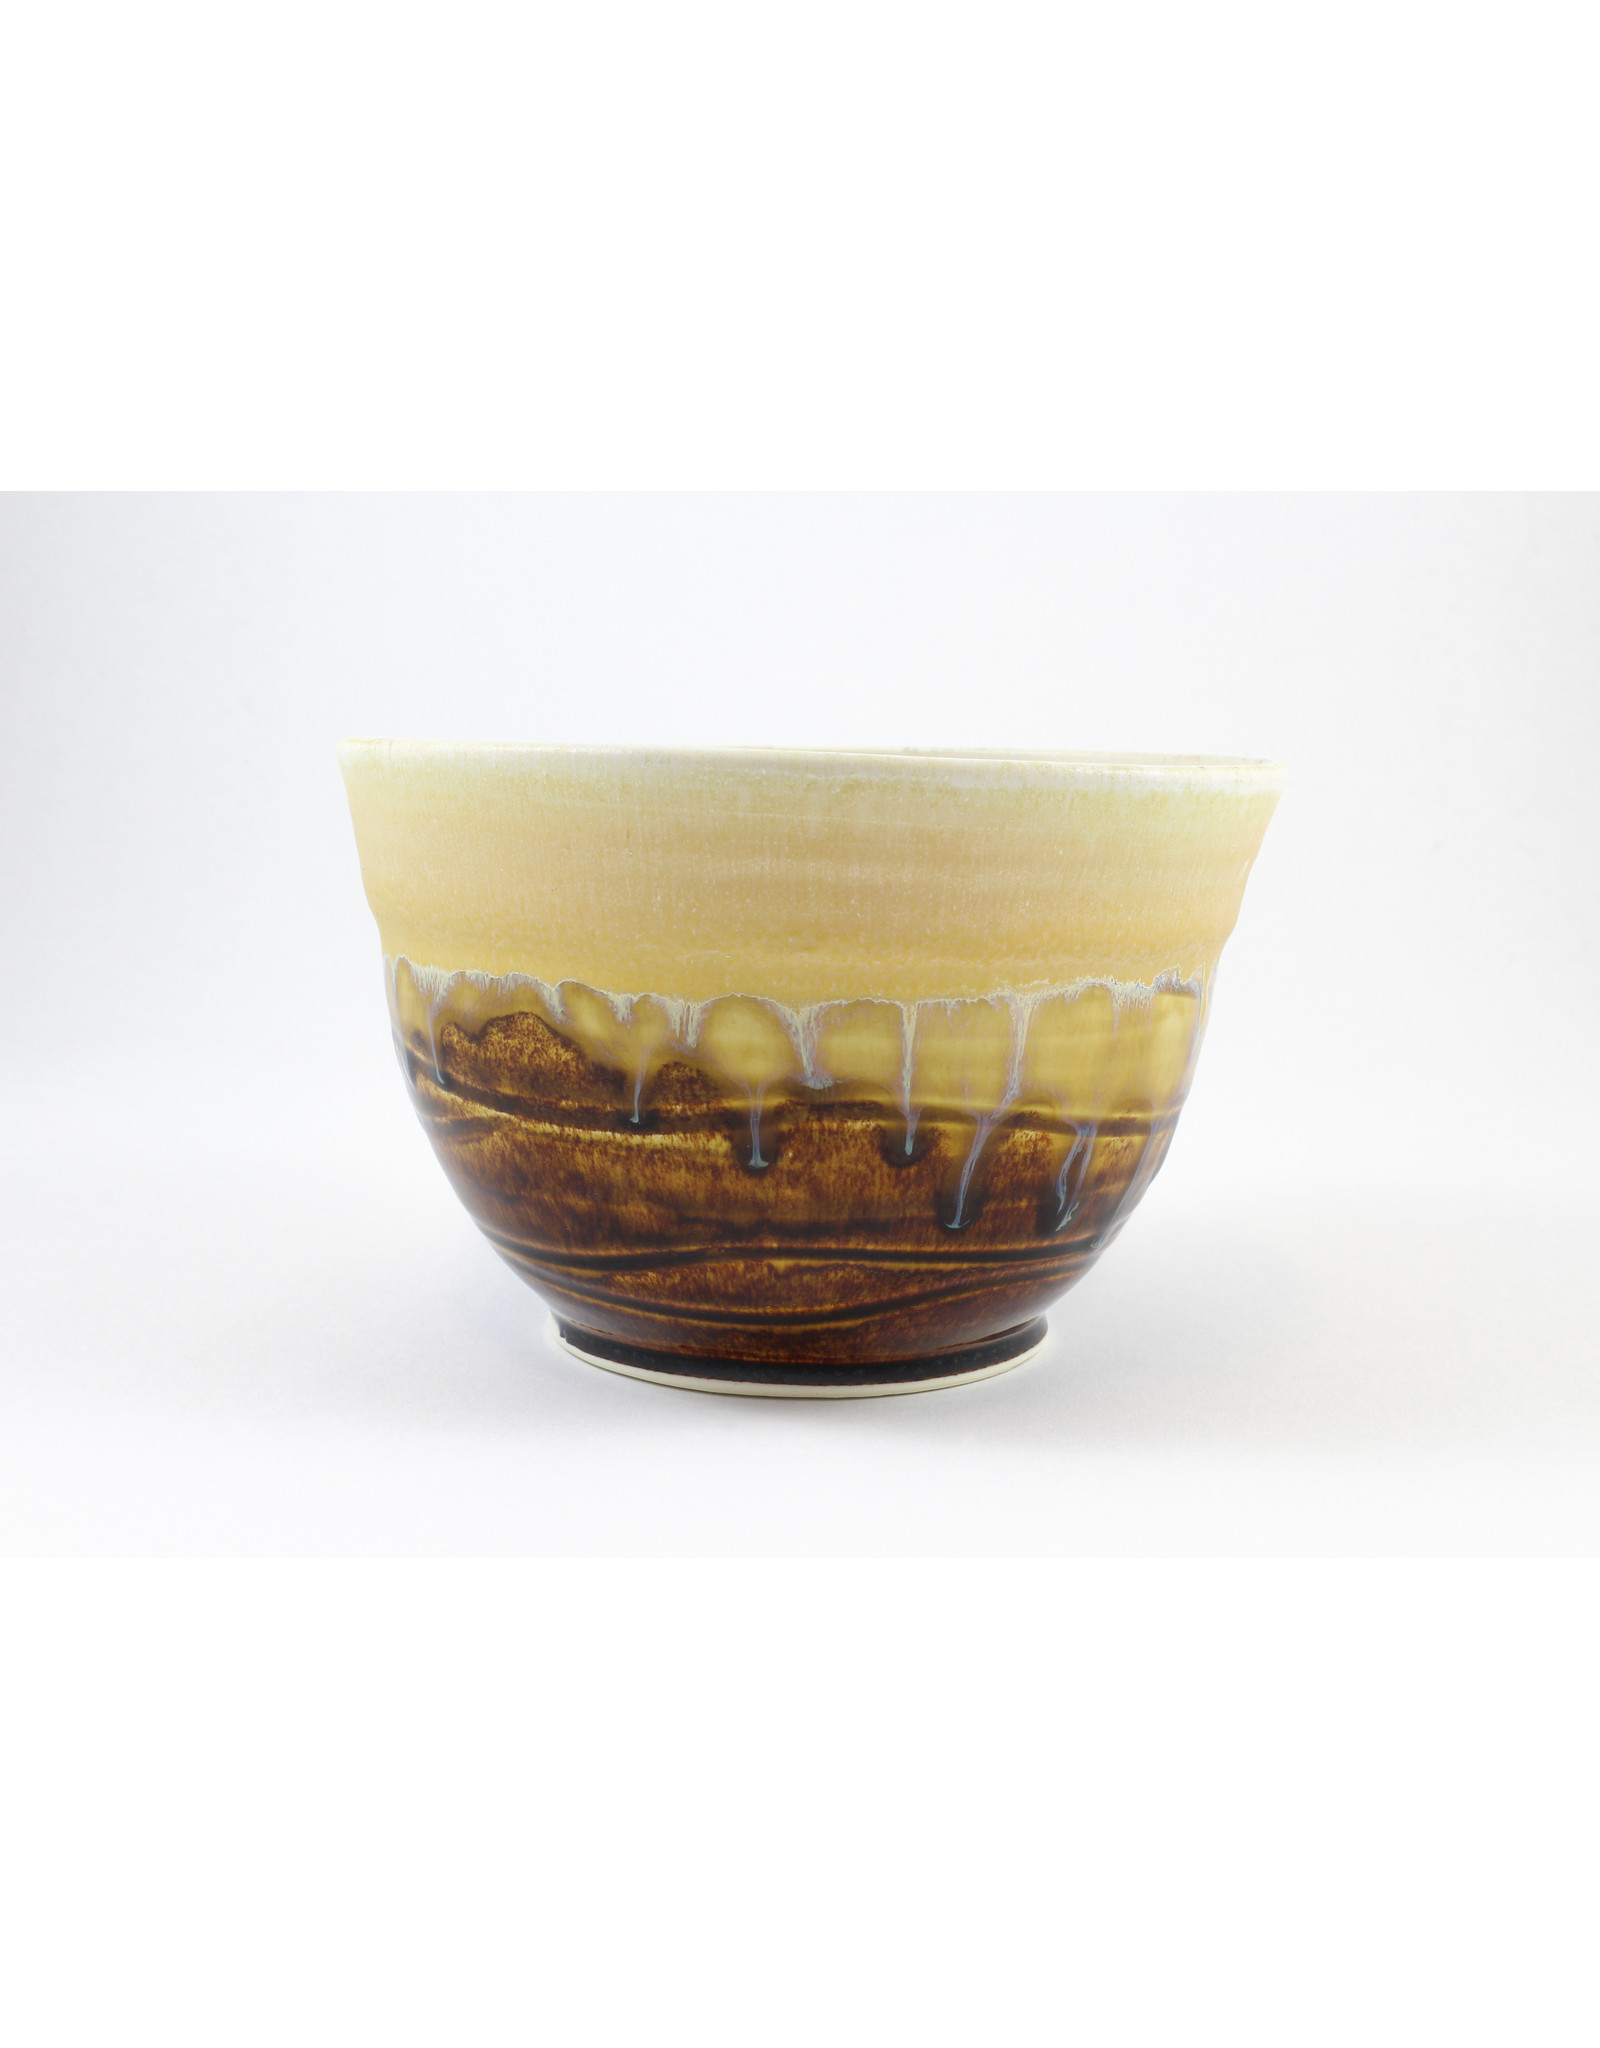 Linda Wright Porcelain Bowl by Linda Wright